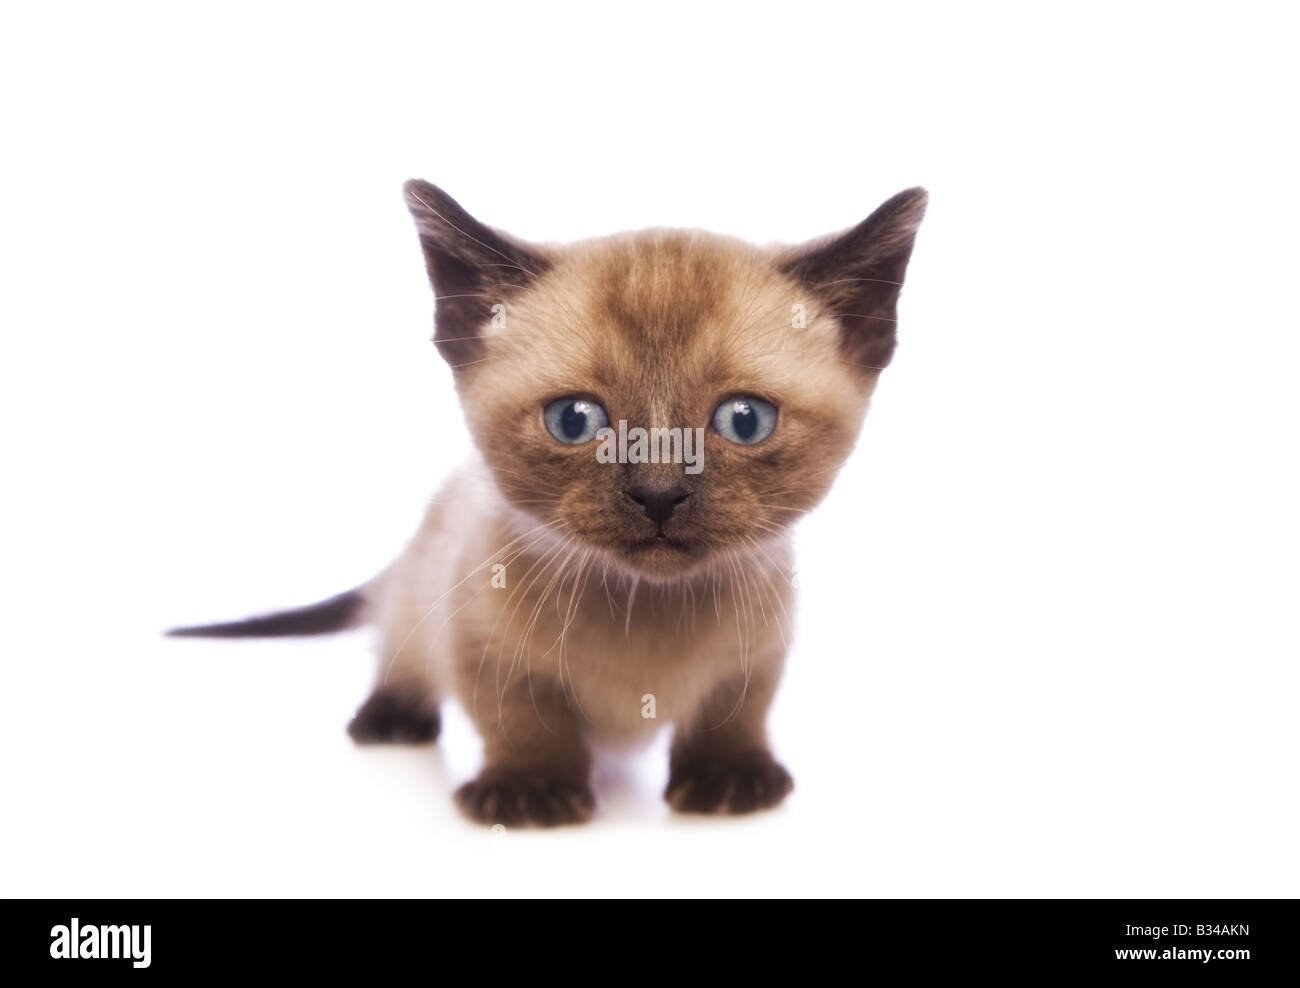 Lindo gatito Munchkin con cabeza grande aislado sobre fondo blanco. Foto de stock